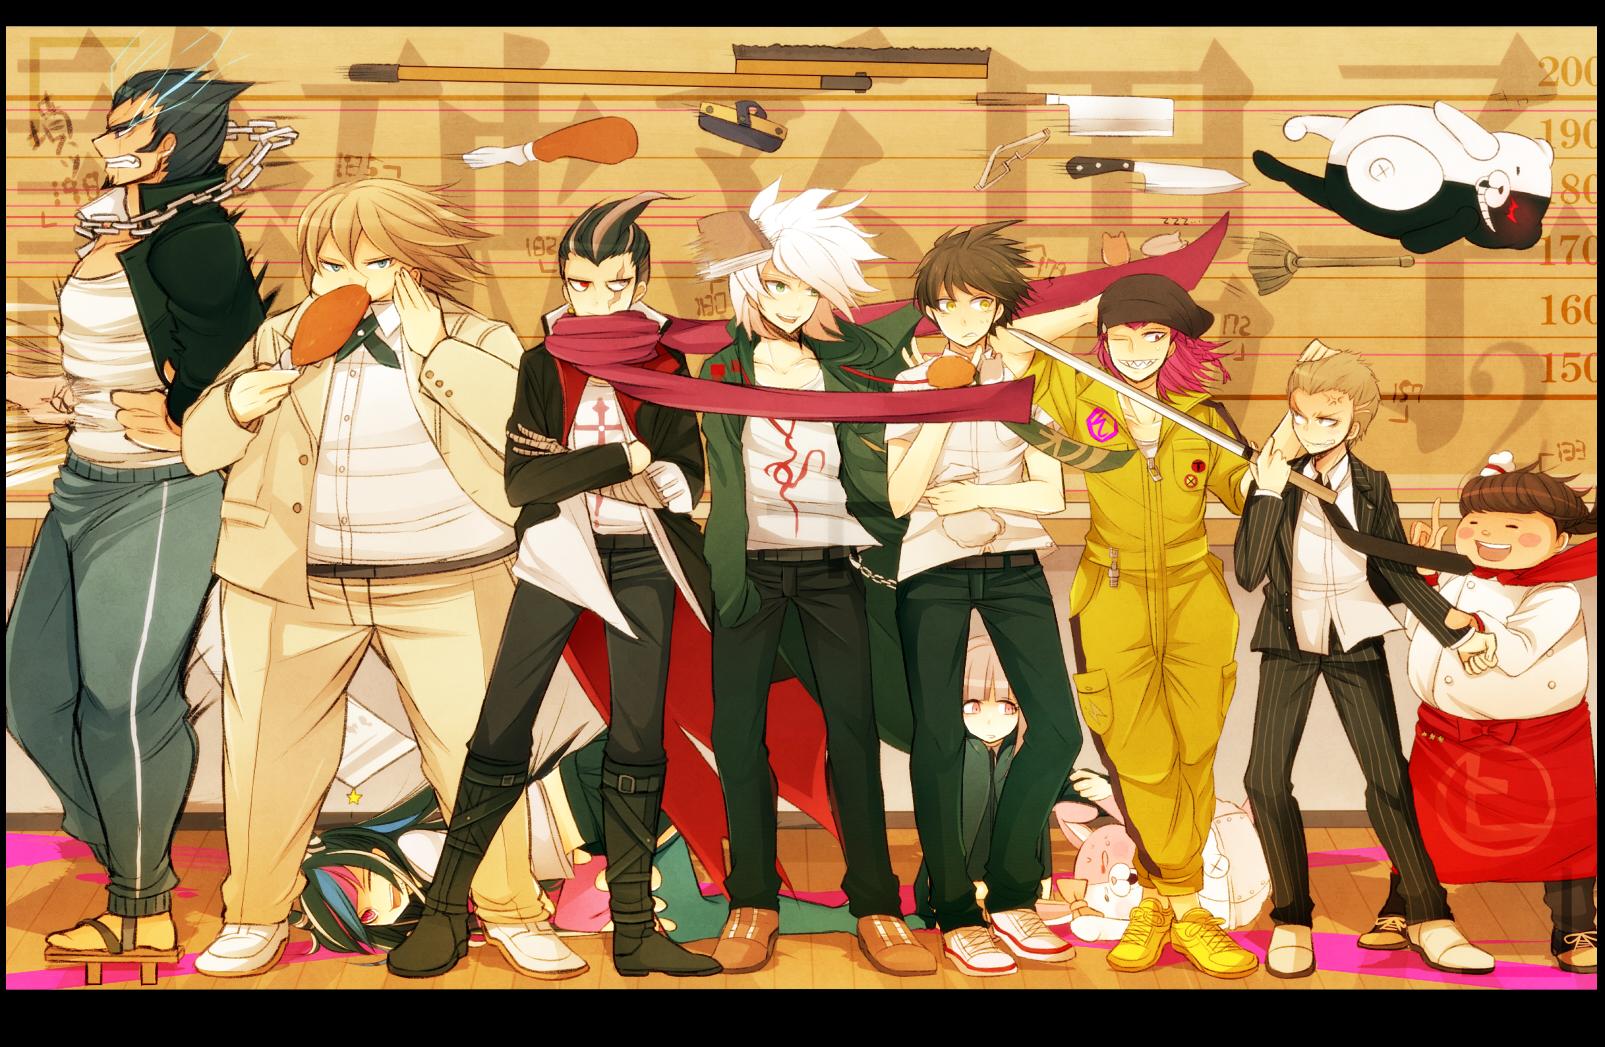 super dangan ronpa 2 anime